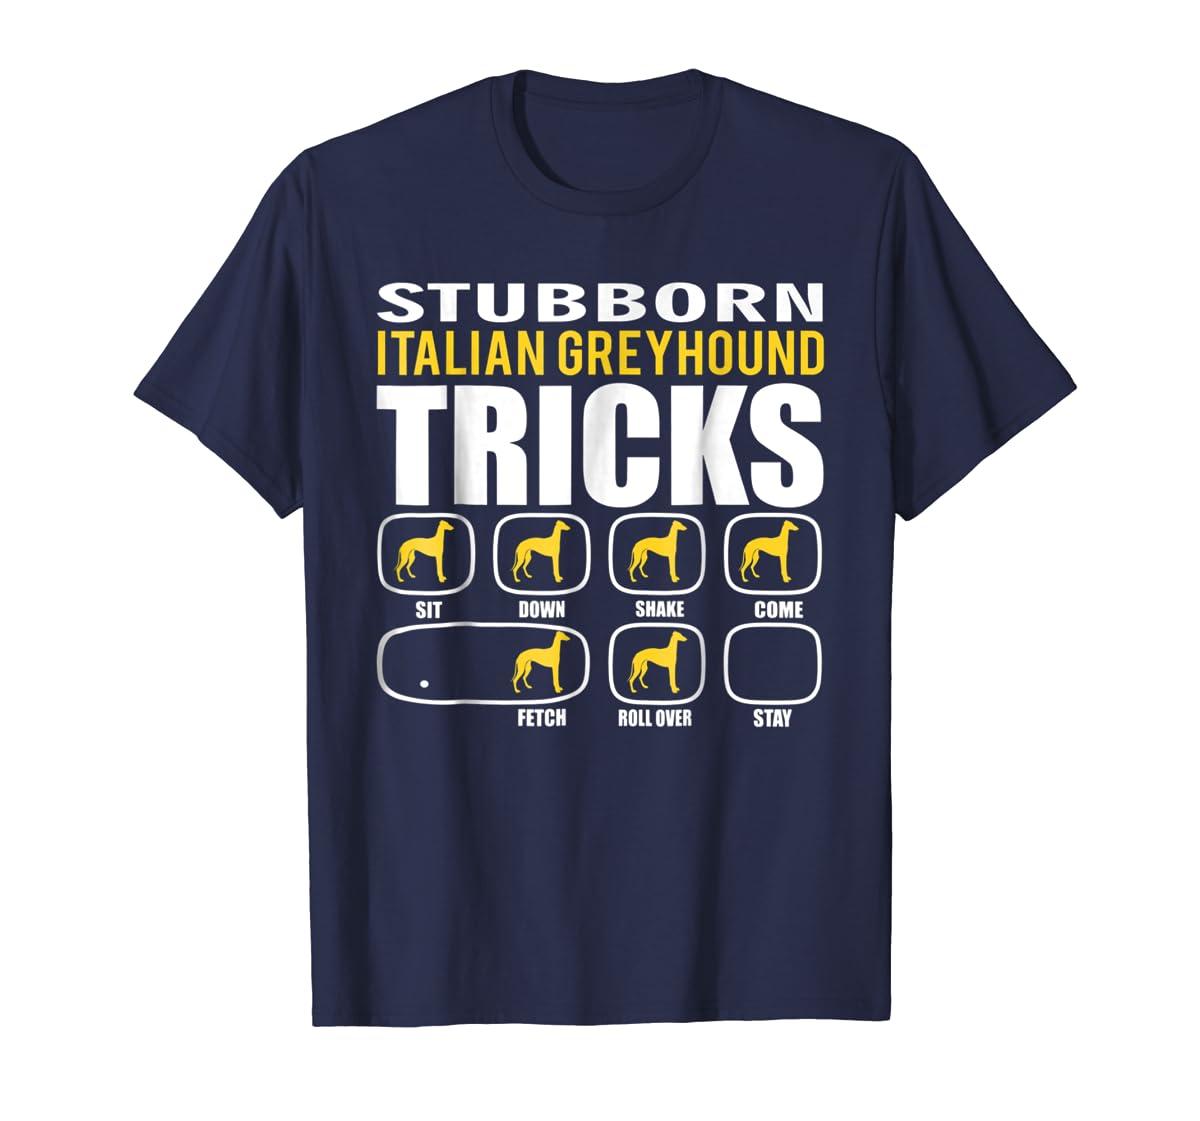 Funny Stubborn Italian Greyhound Tricks T-Shirt-Men's T-Shirt-Navy